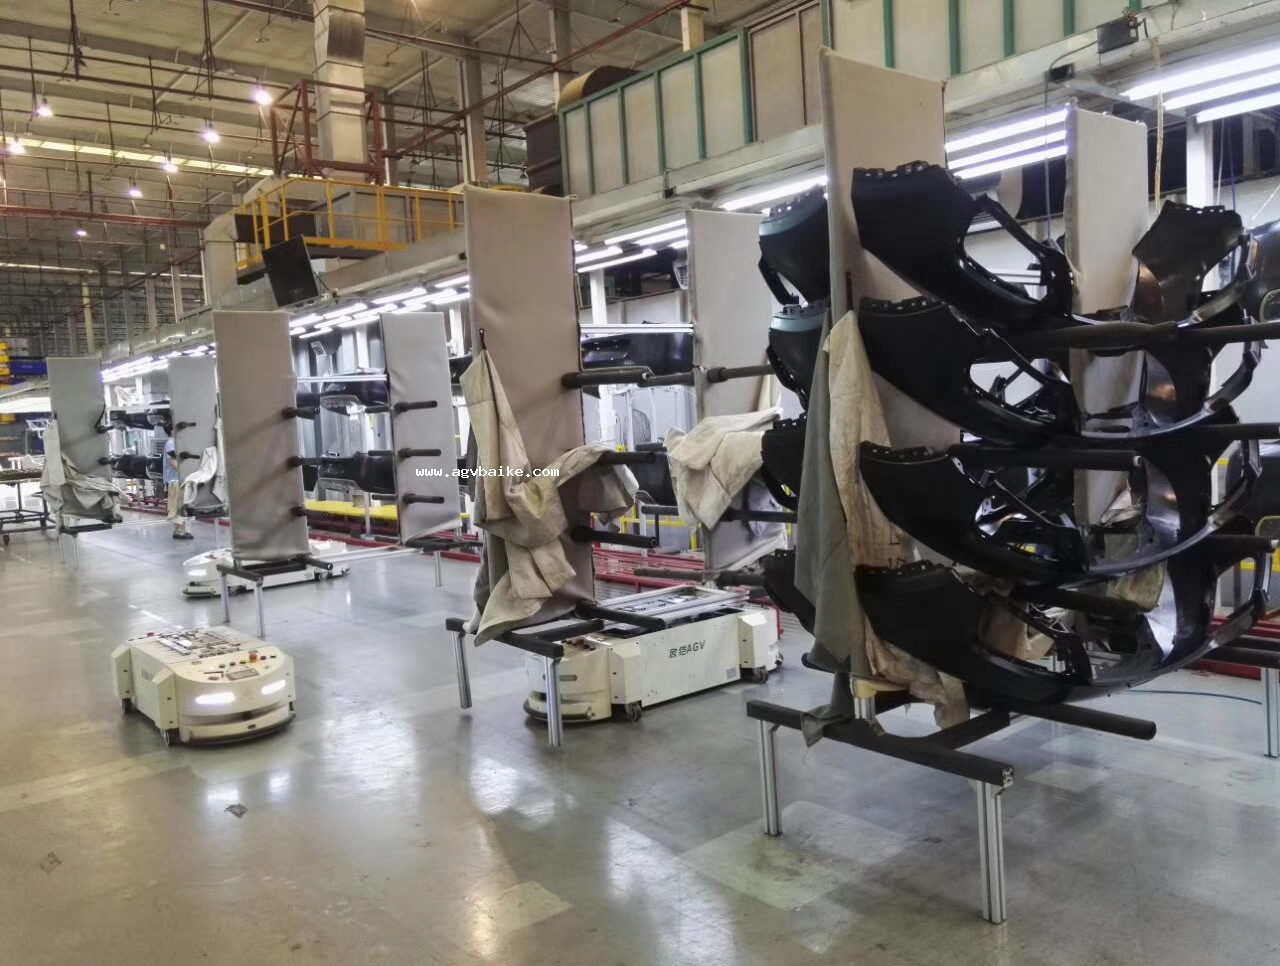 AGV智能机器人助力工厂自动化发展